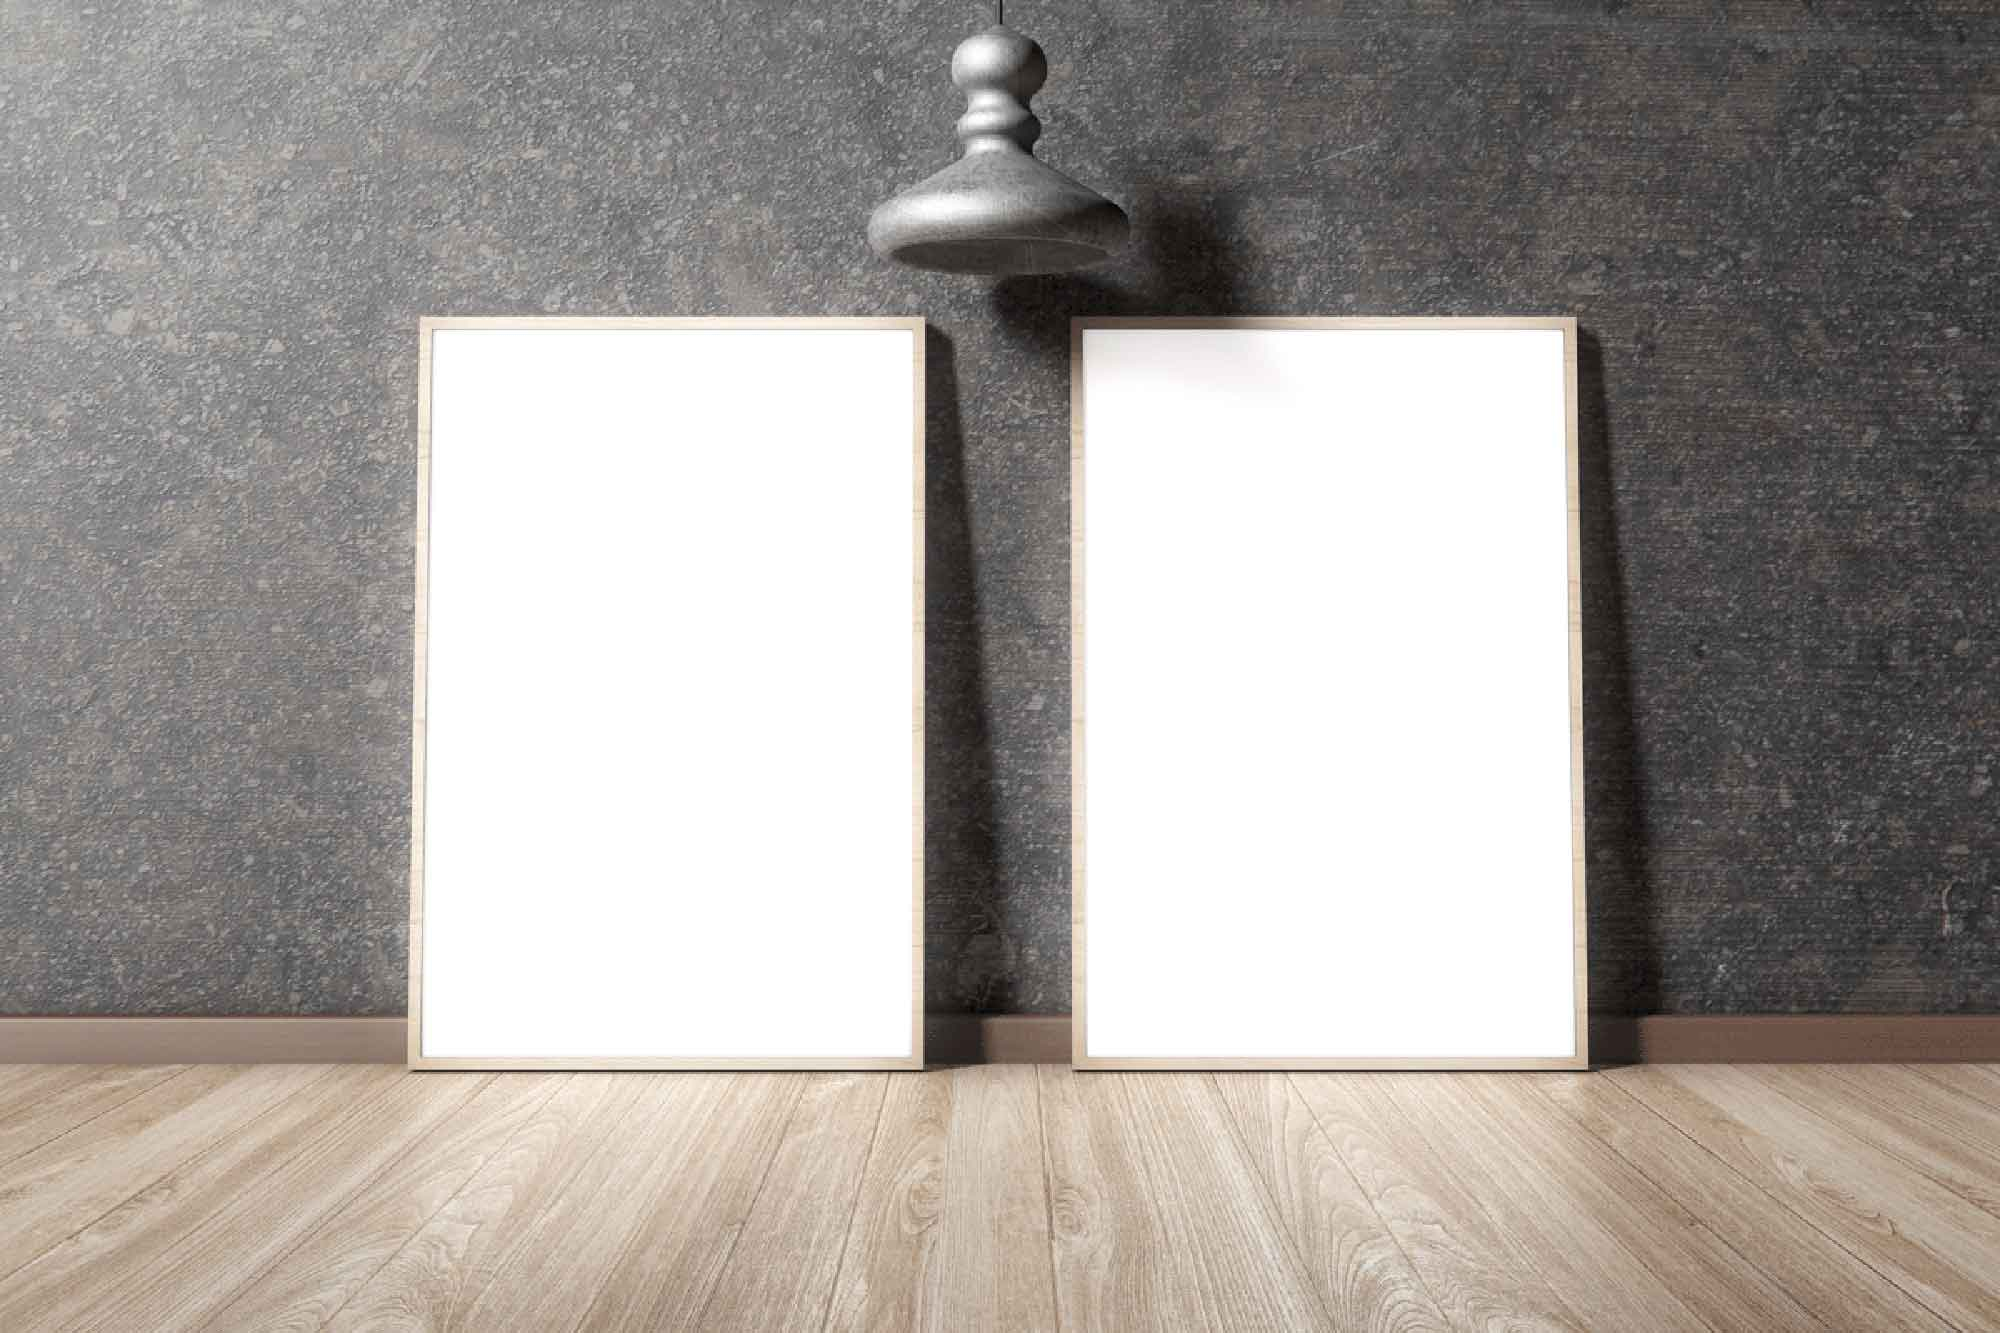 Twin Modern Interior Posters Mockup 2